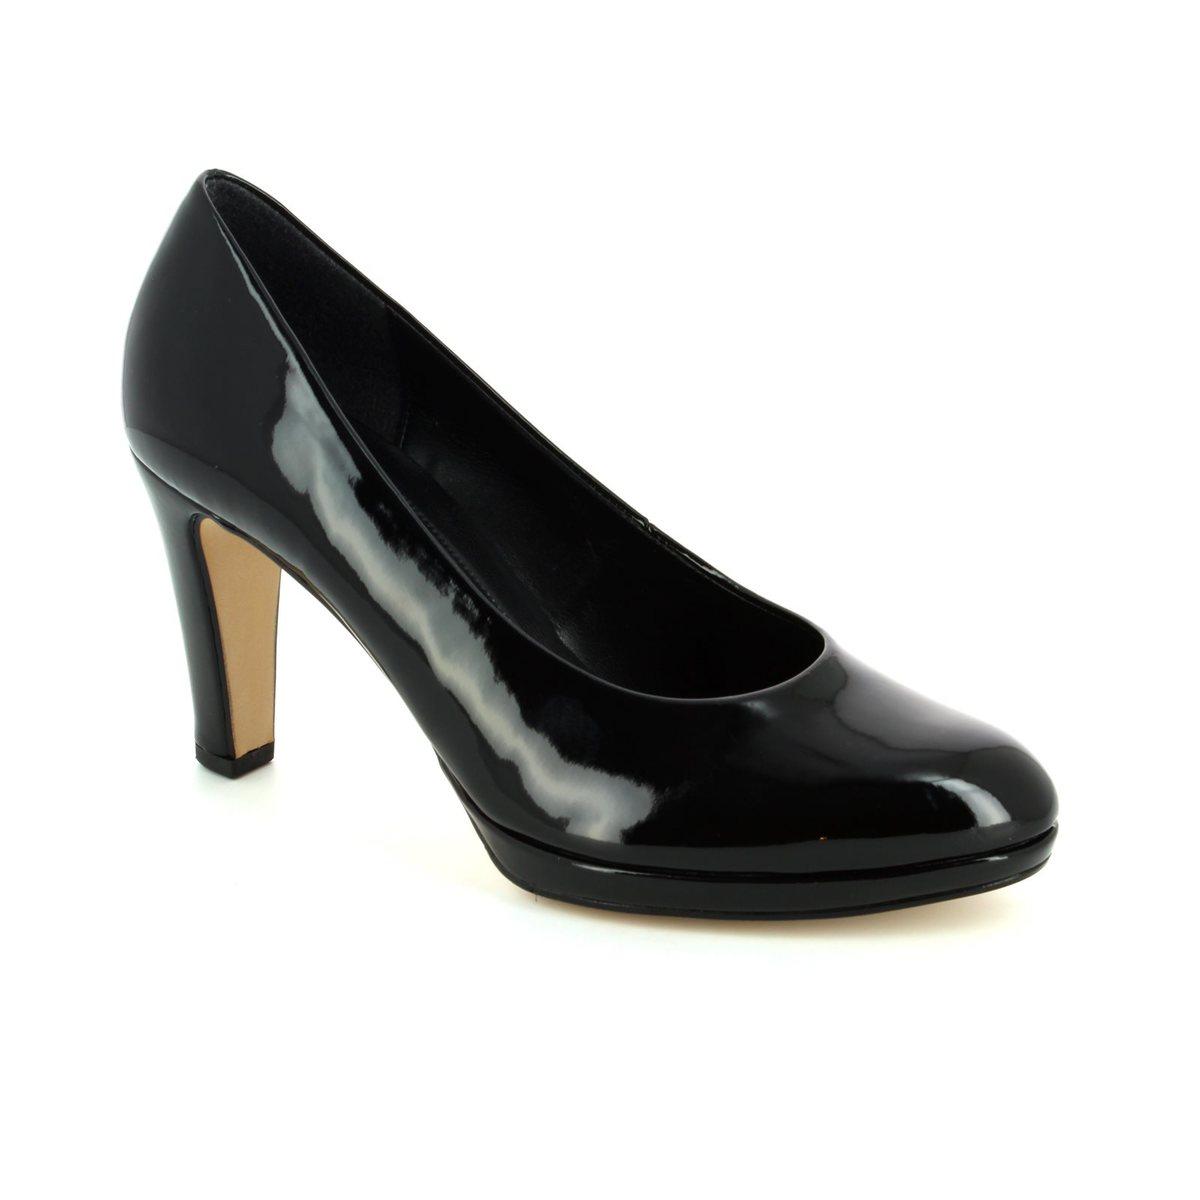 531055216 Gabor High-heeled Shoes - Black patent - 51.270.77 SPLENDID